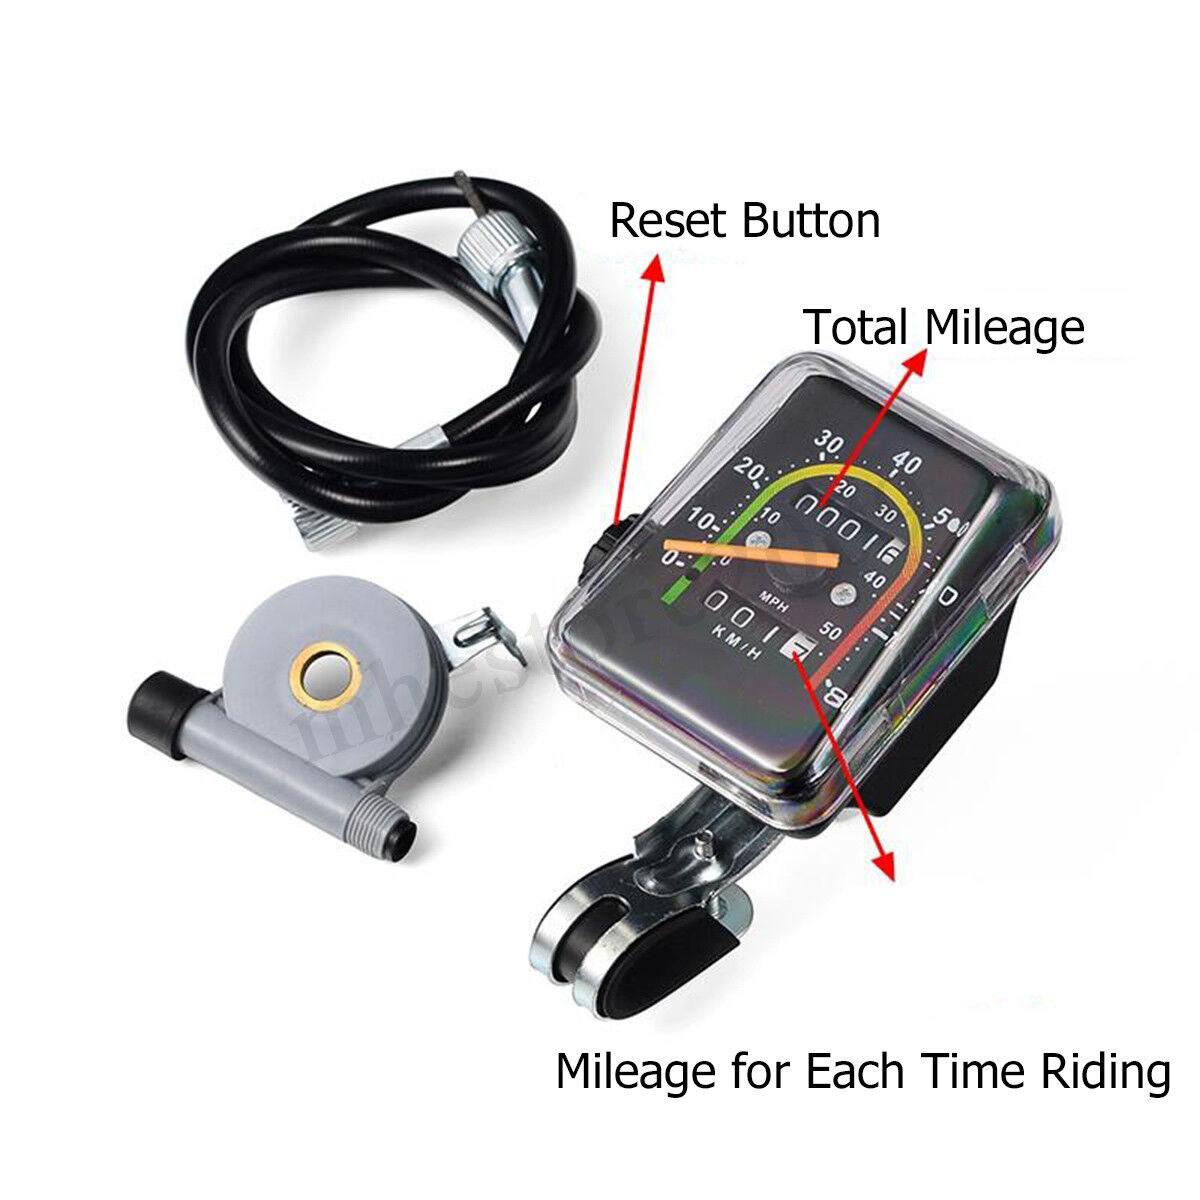 Universal Mechanical Speedometer Motorized Bicycle Bike MTB Stopwatch Odometer